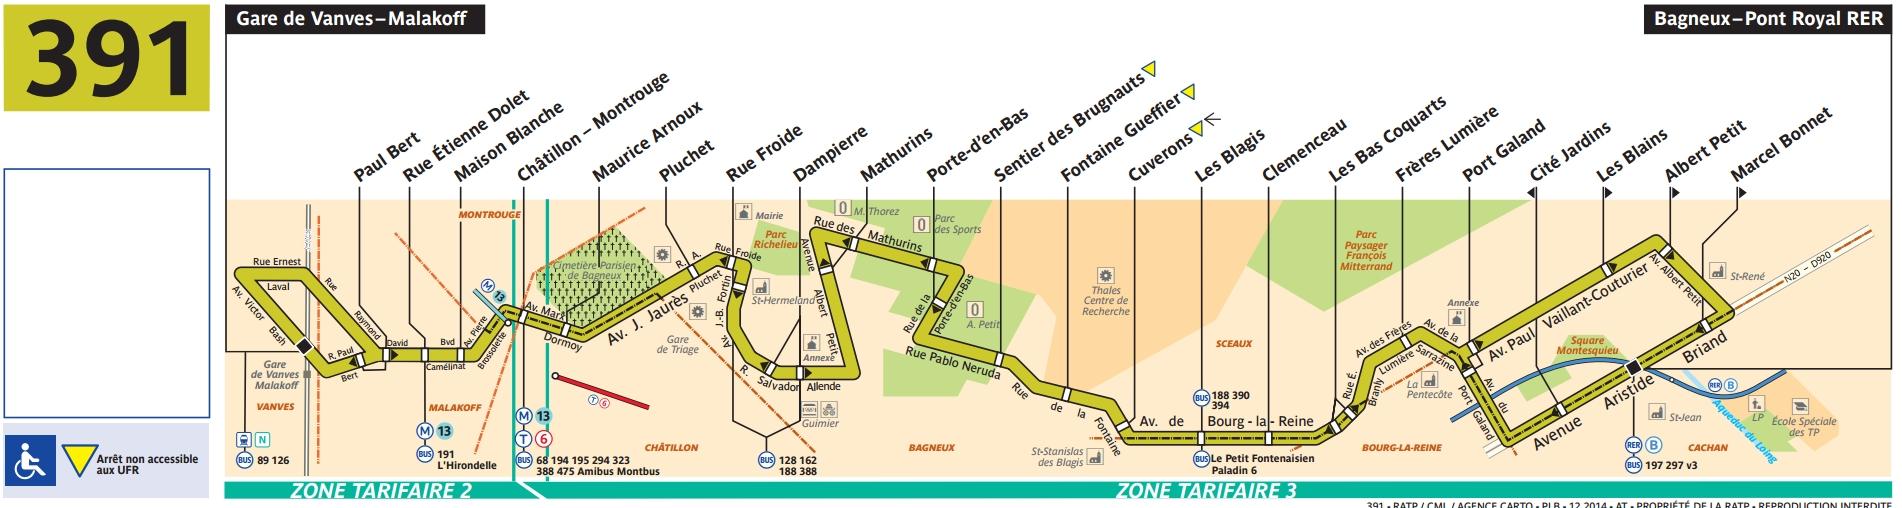 Plan bus Ligne 391